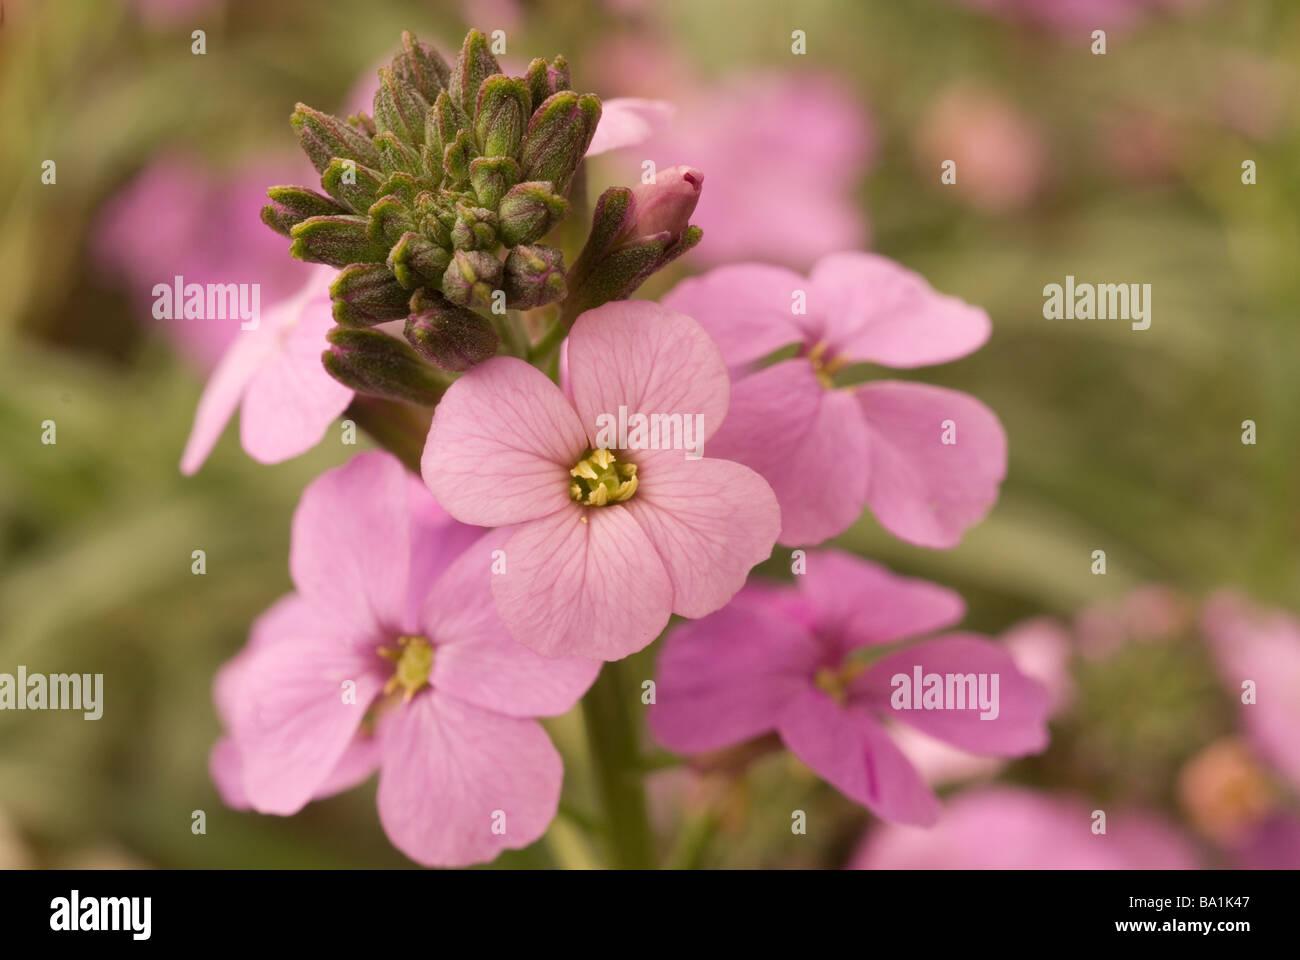 Bowles' perennial wallflower Erysimum bicolor 'Bowles' Mauve',  violacciocche, Brassicaceae - Stock Image